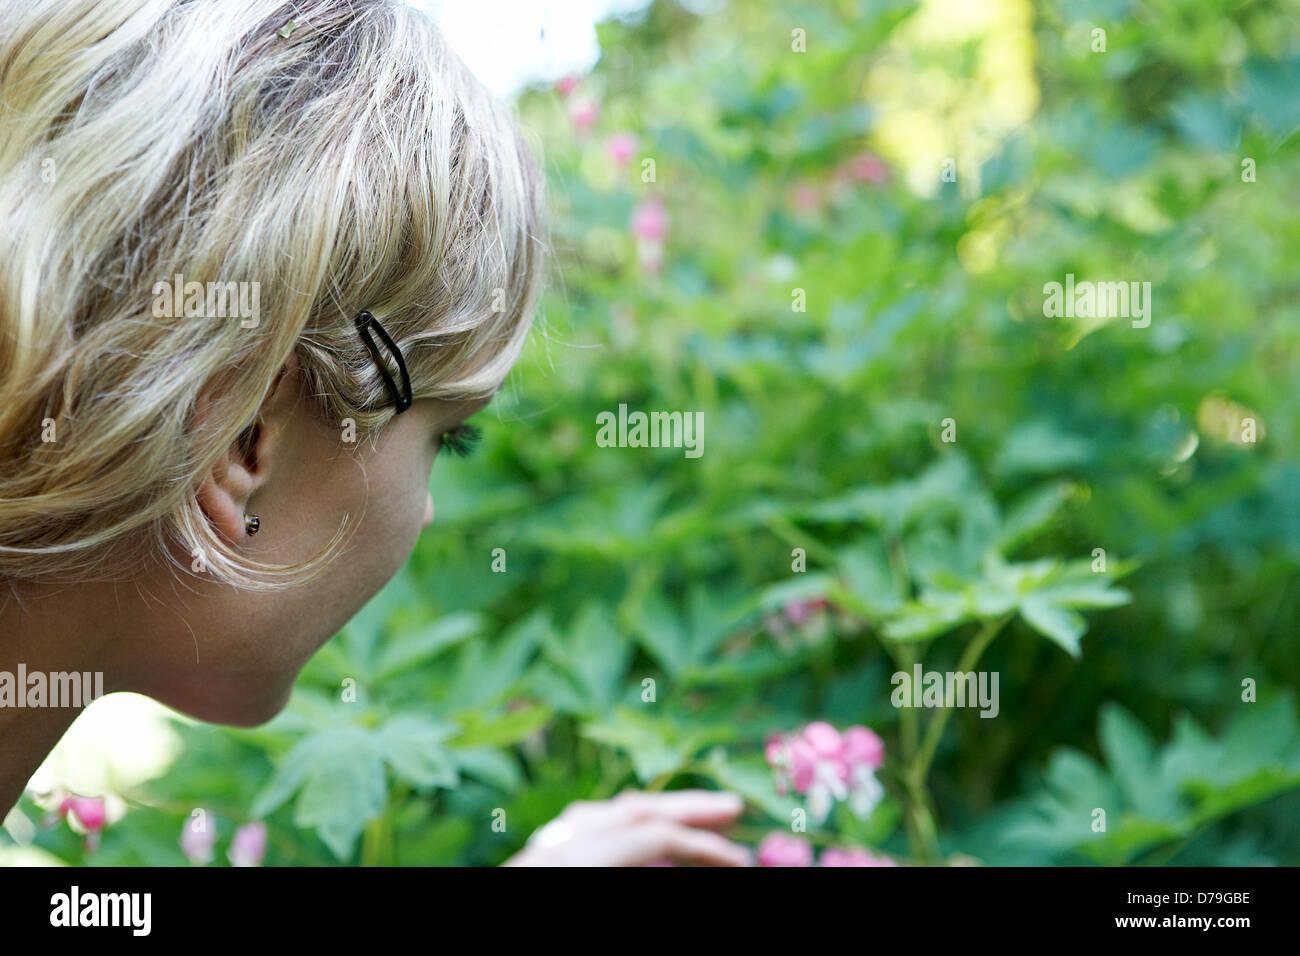 Woman picking bleeding heart flower in profile - Stock Image